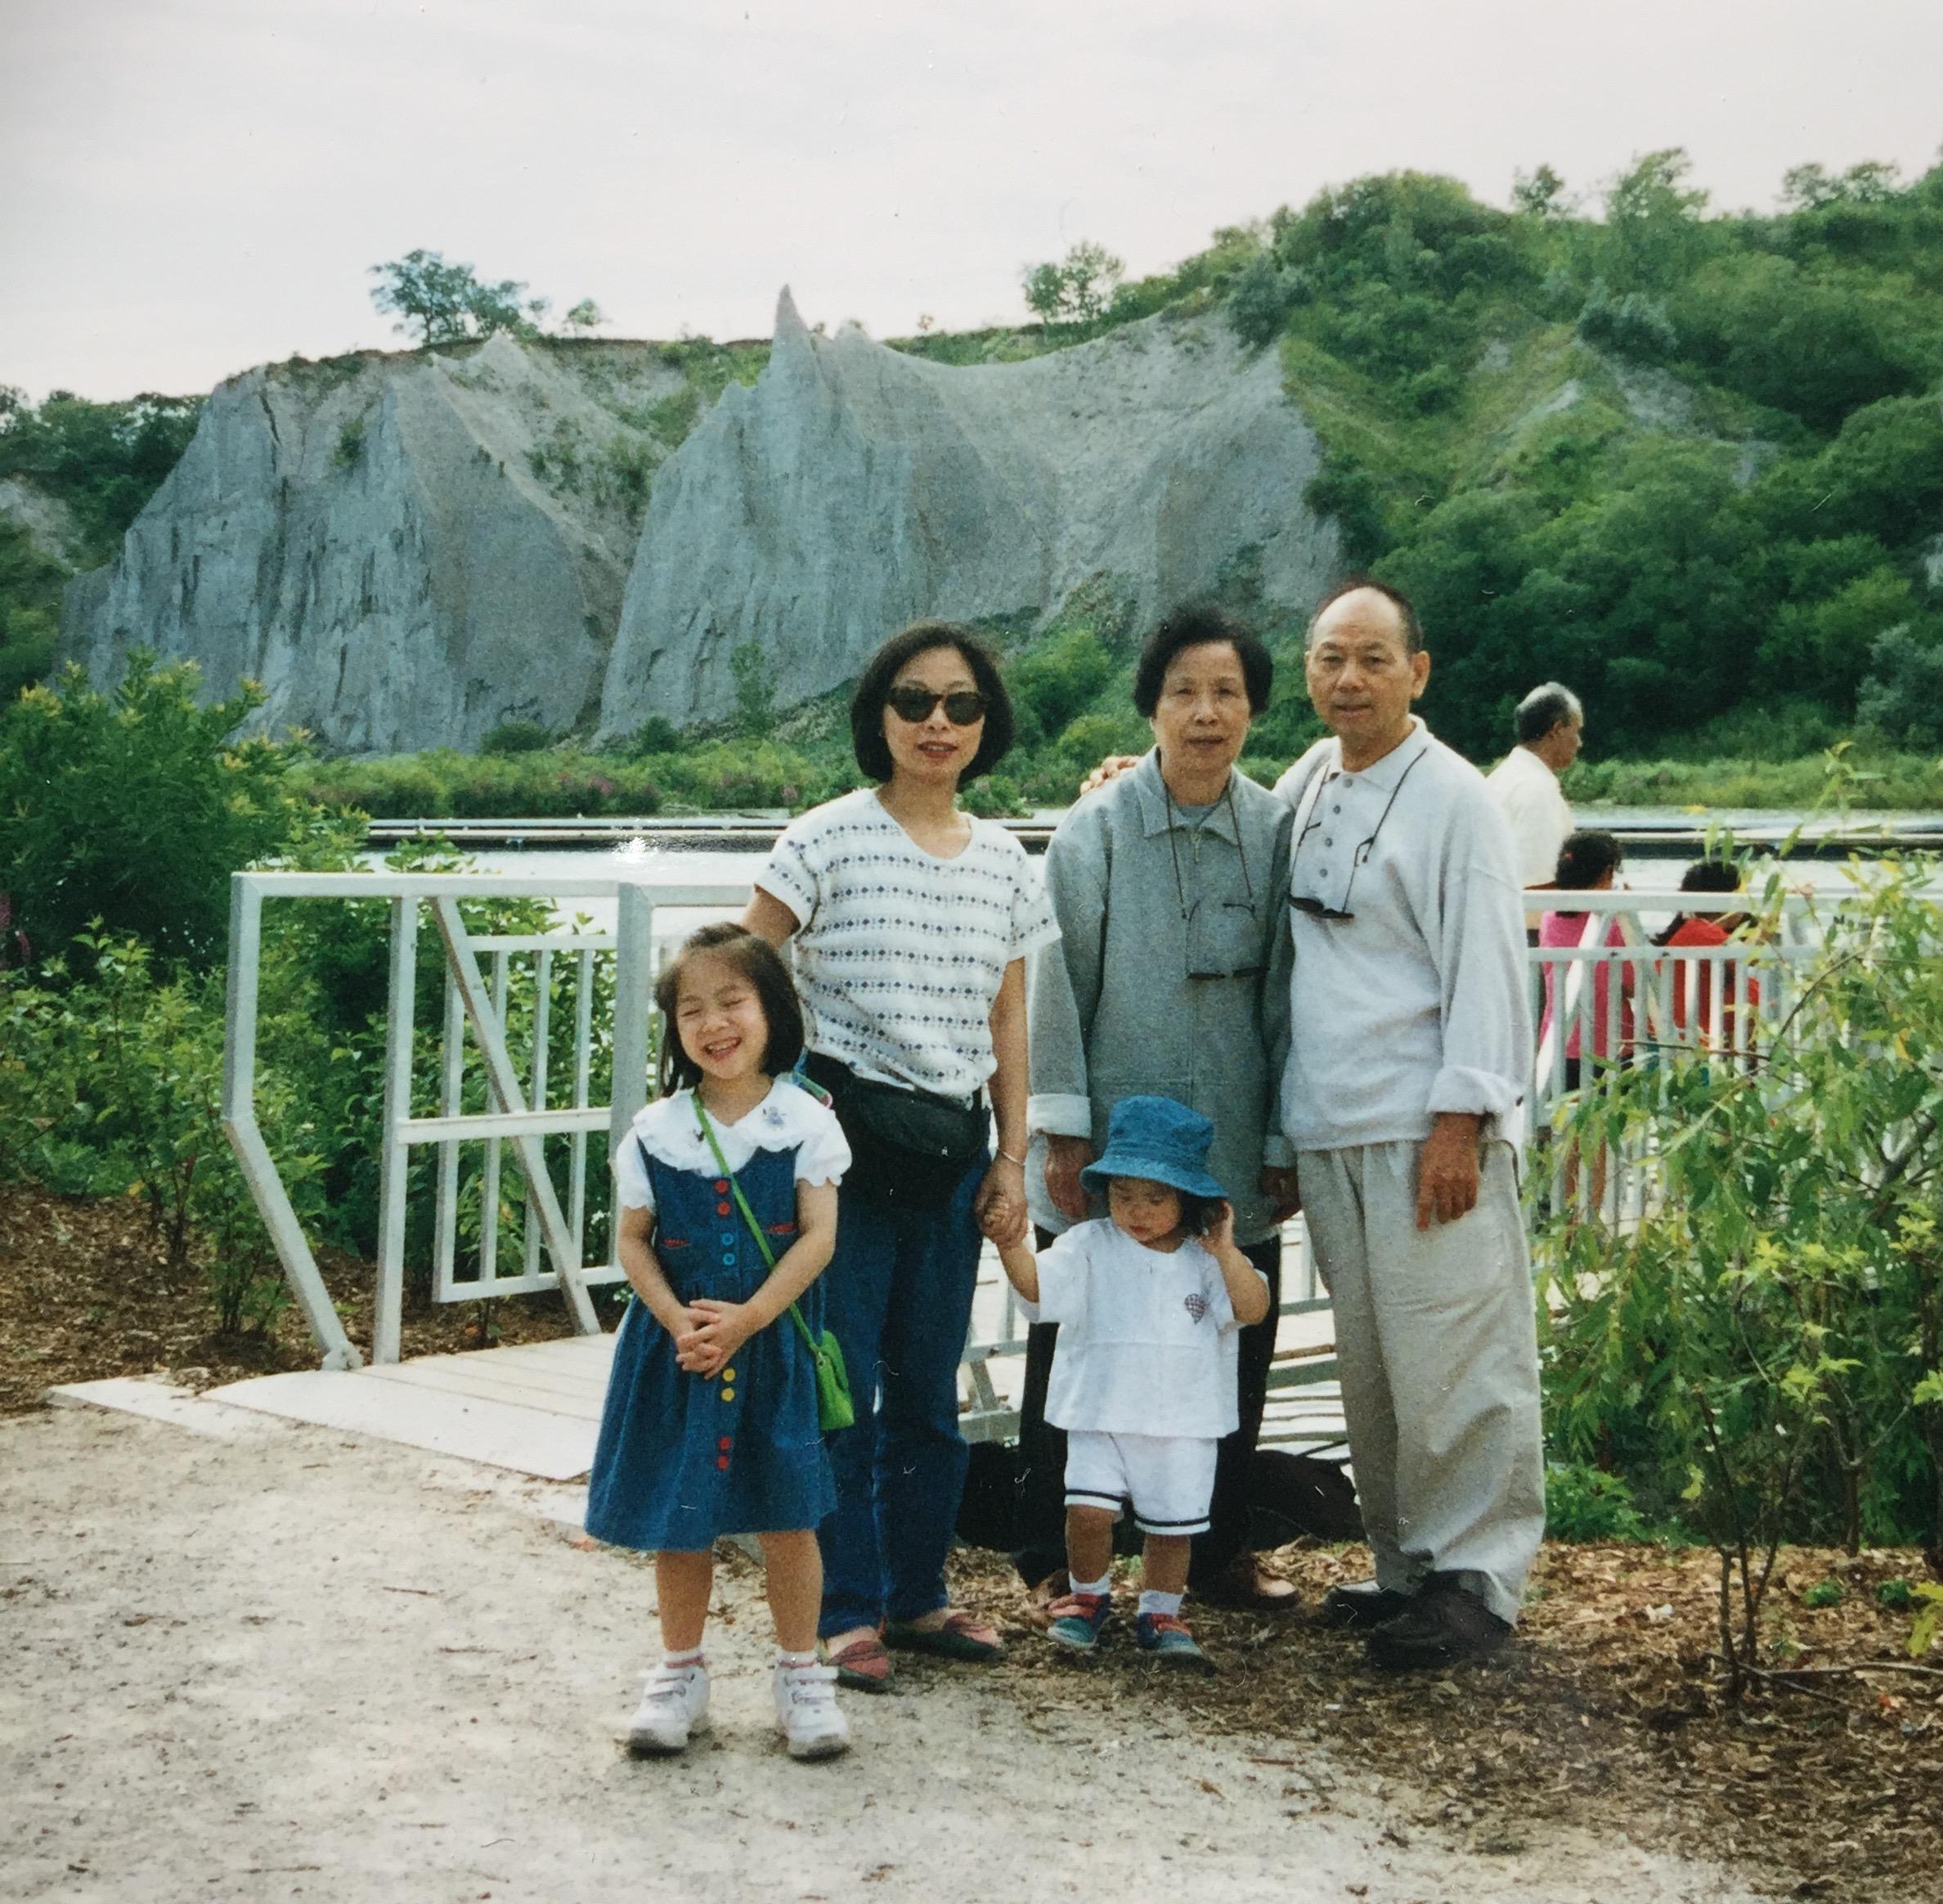 A tidbit on family